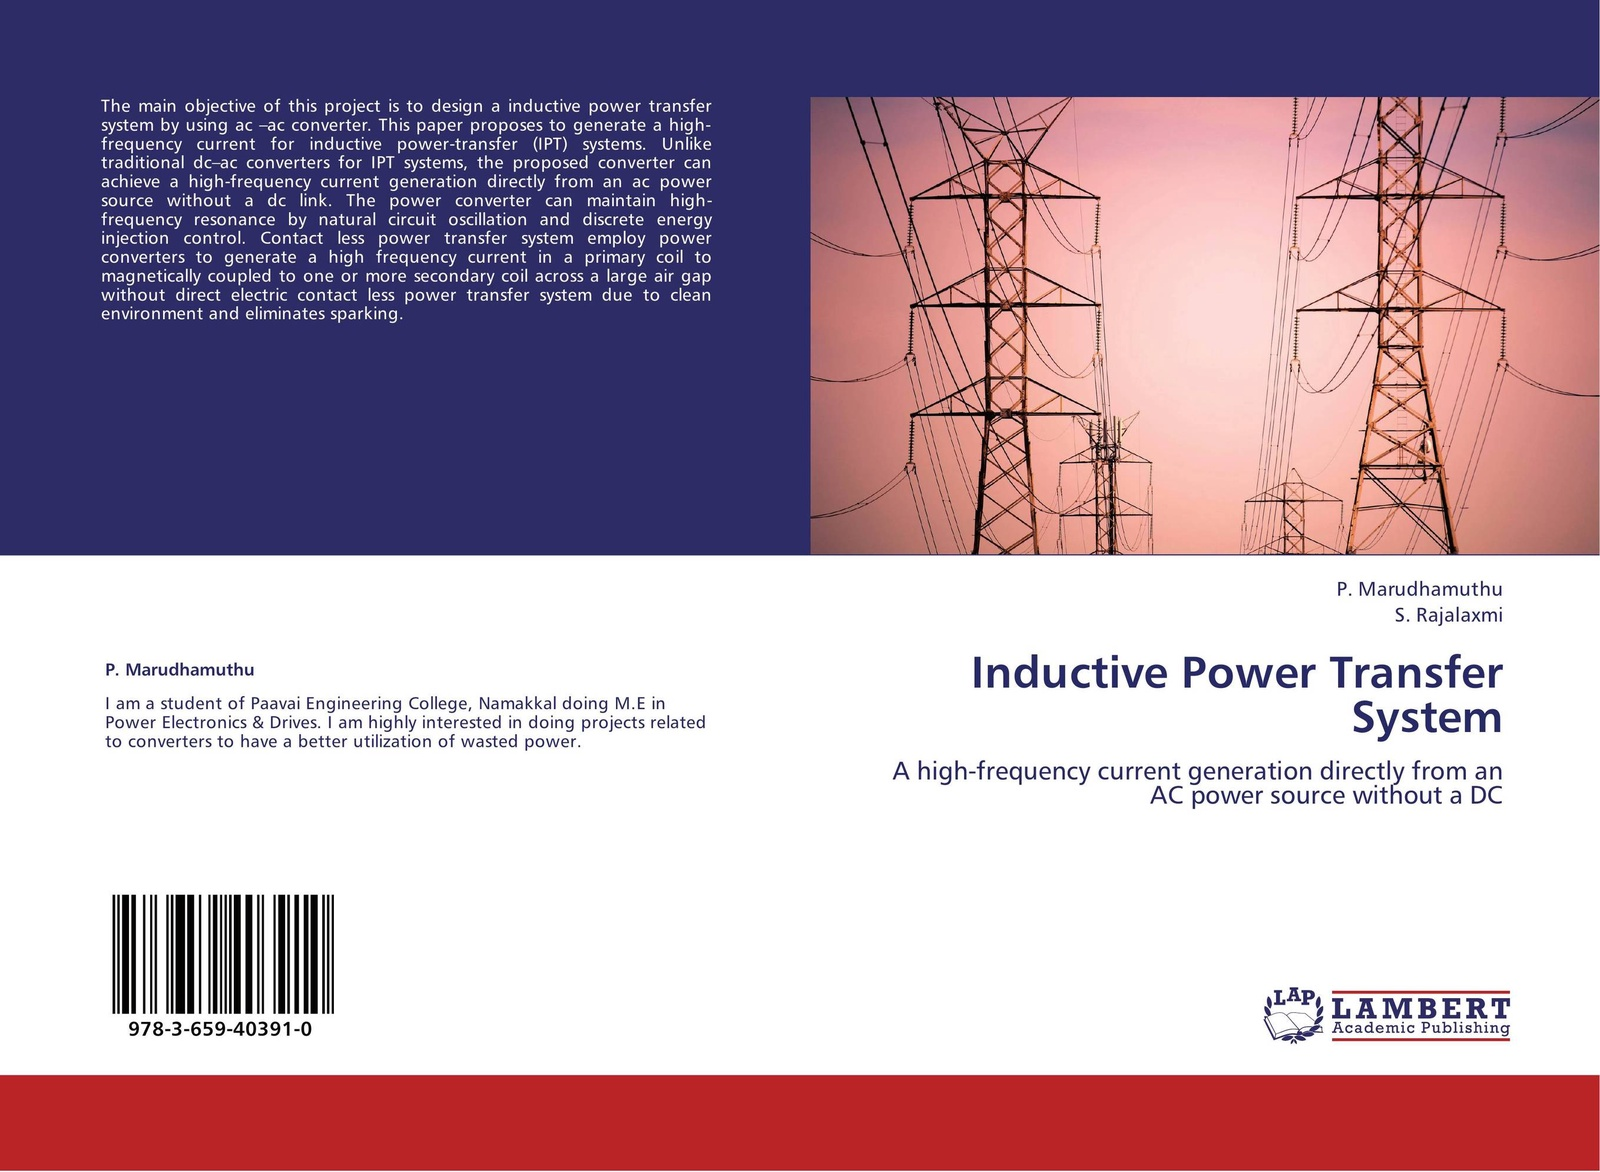 P. Marudhamuthu and S. Rajalaxmi Inductive Power Transfer System цена